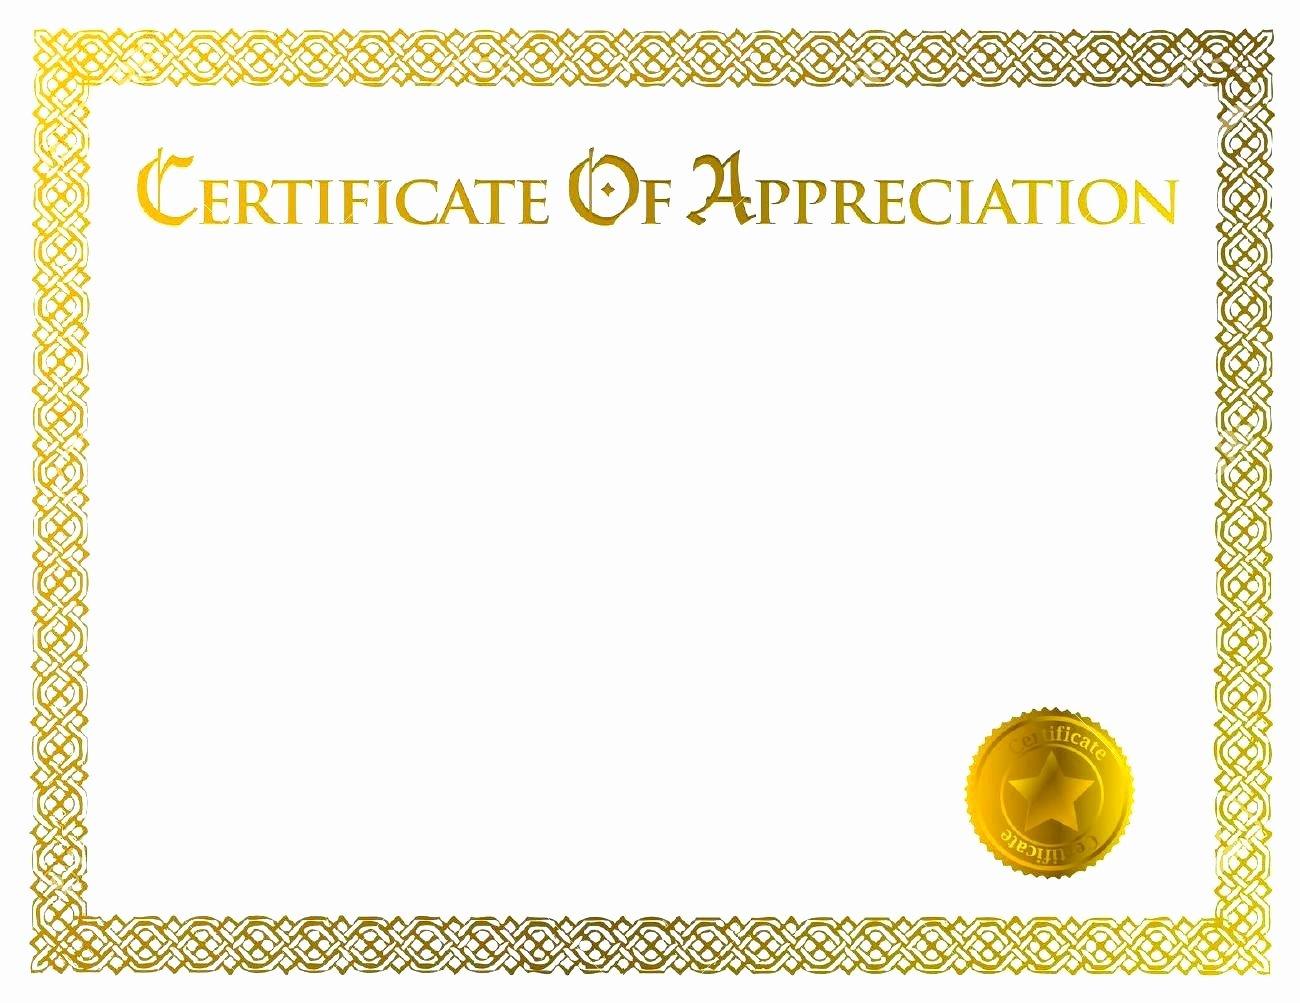 Blank Certificate Appreciation Templates